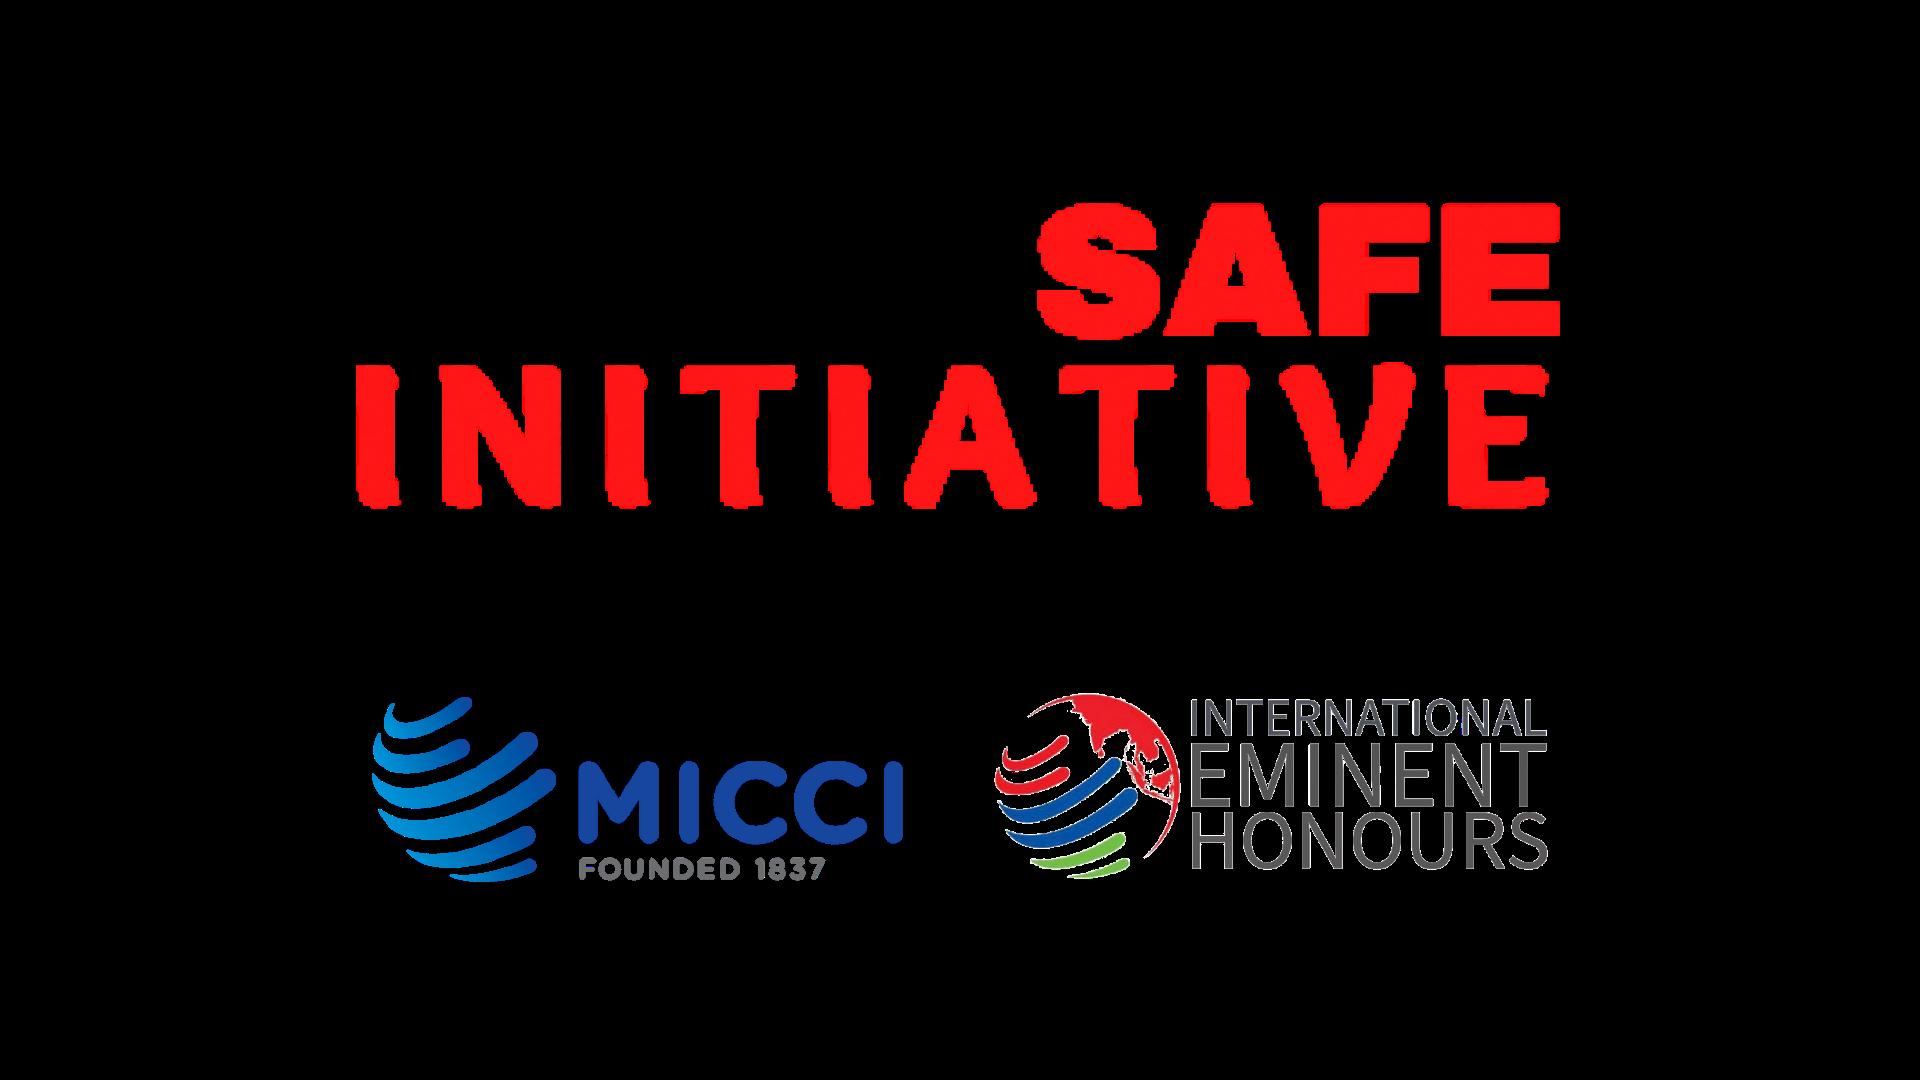 Work Safe Initiative